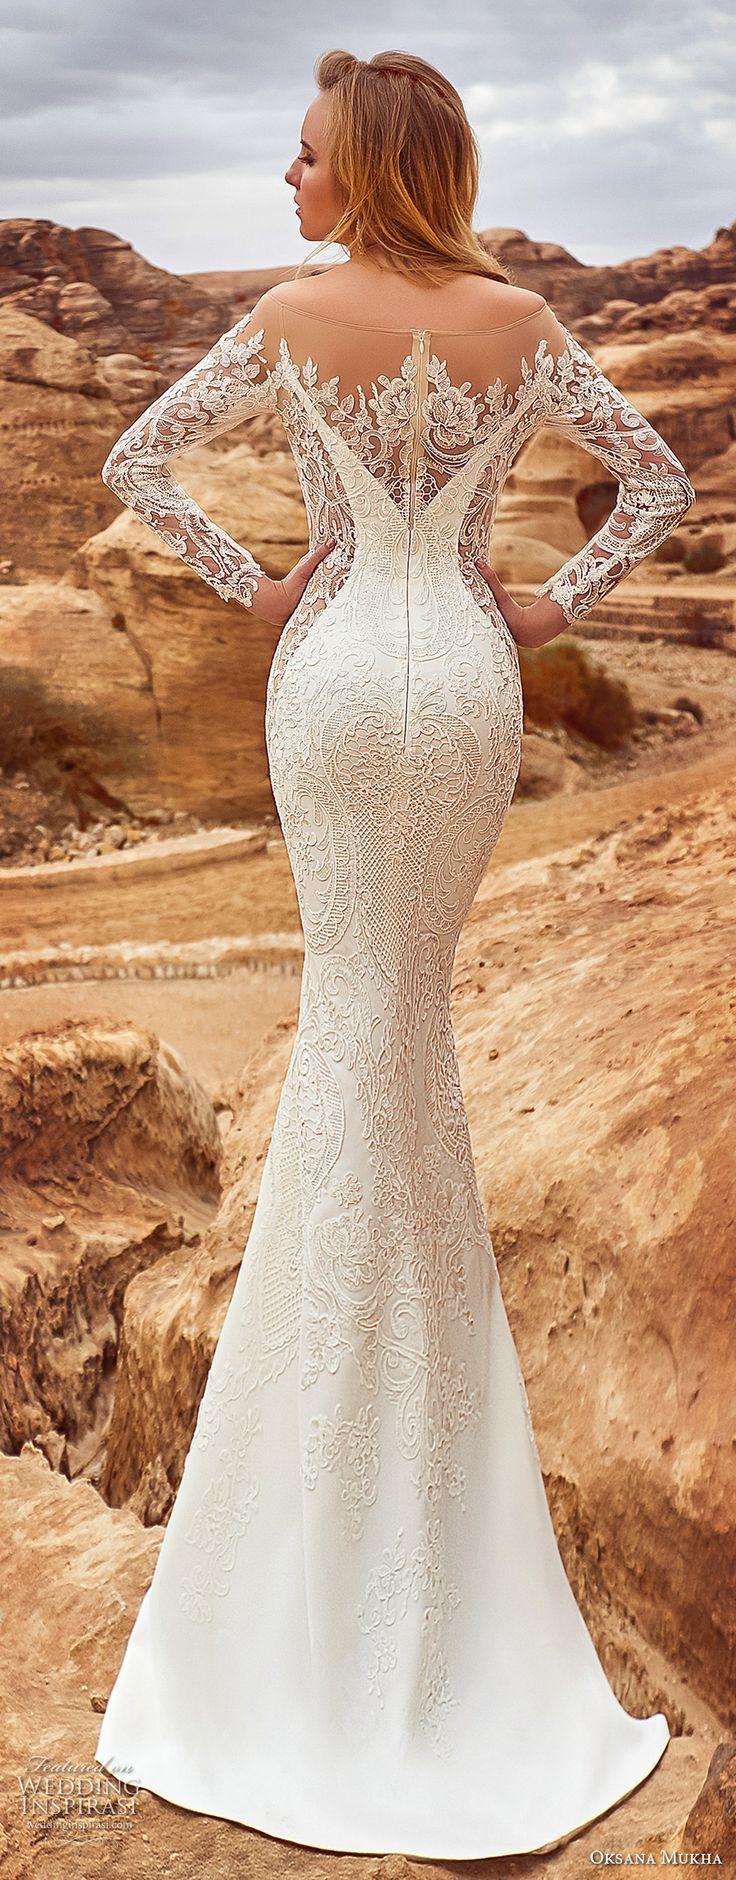 oksana mukha 2018 bridal long sleeves off the shoulder sweetheart neckline full embellishment elegant glamorous fit and flare wedding dress sheer lace back sweep train (armadea) bv -- Oksana Mukha 2018 Wedding Dresses